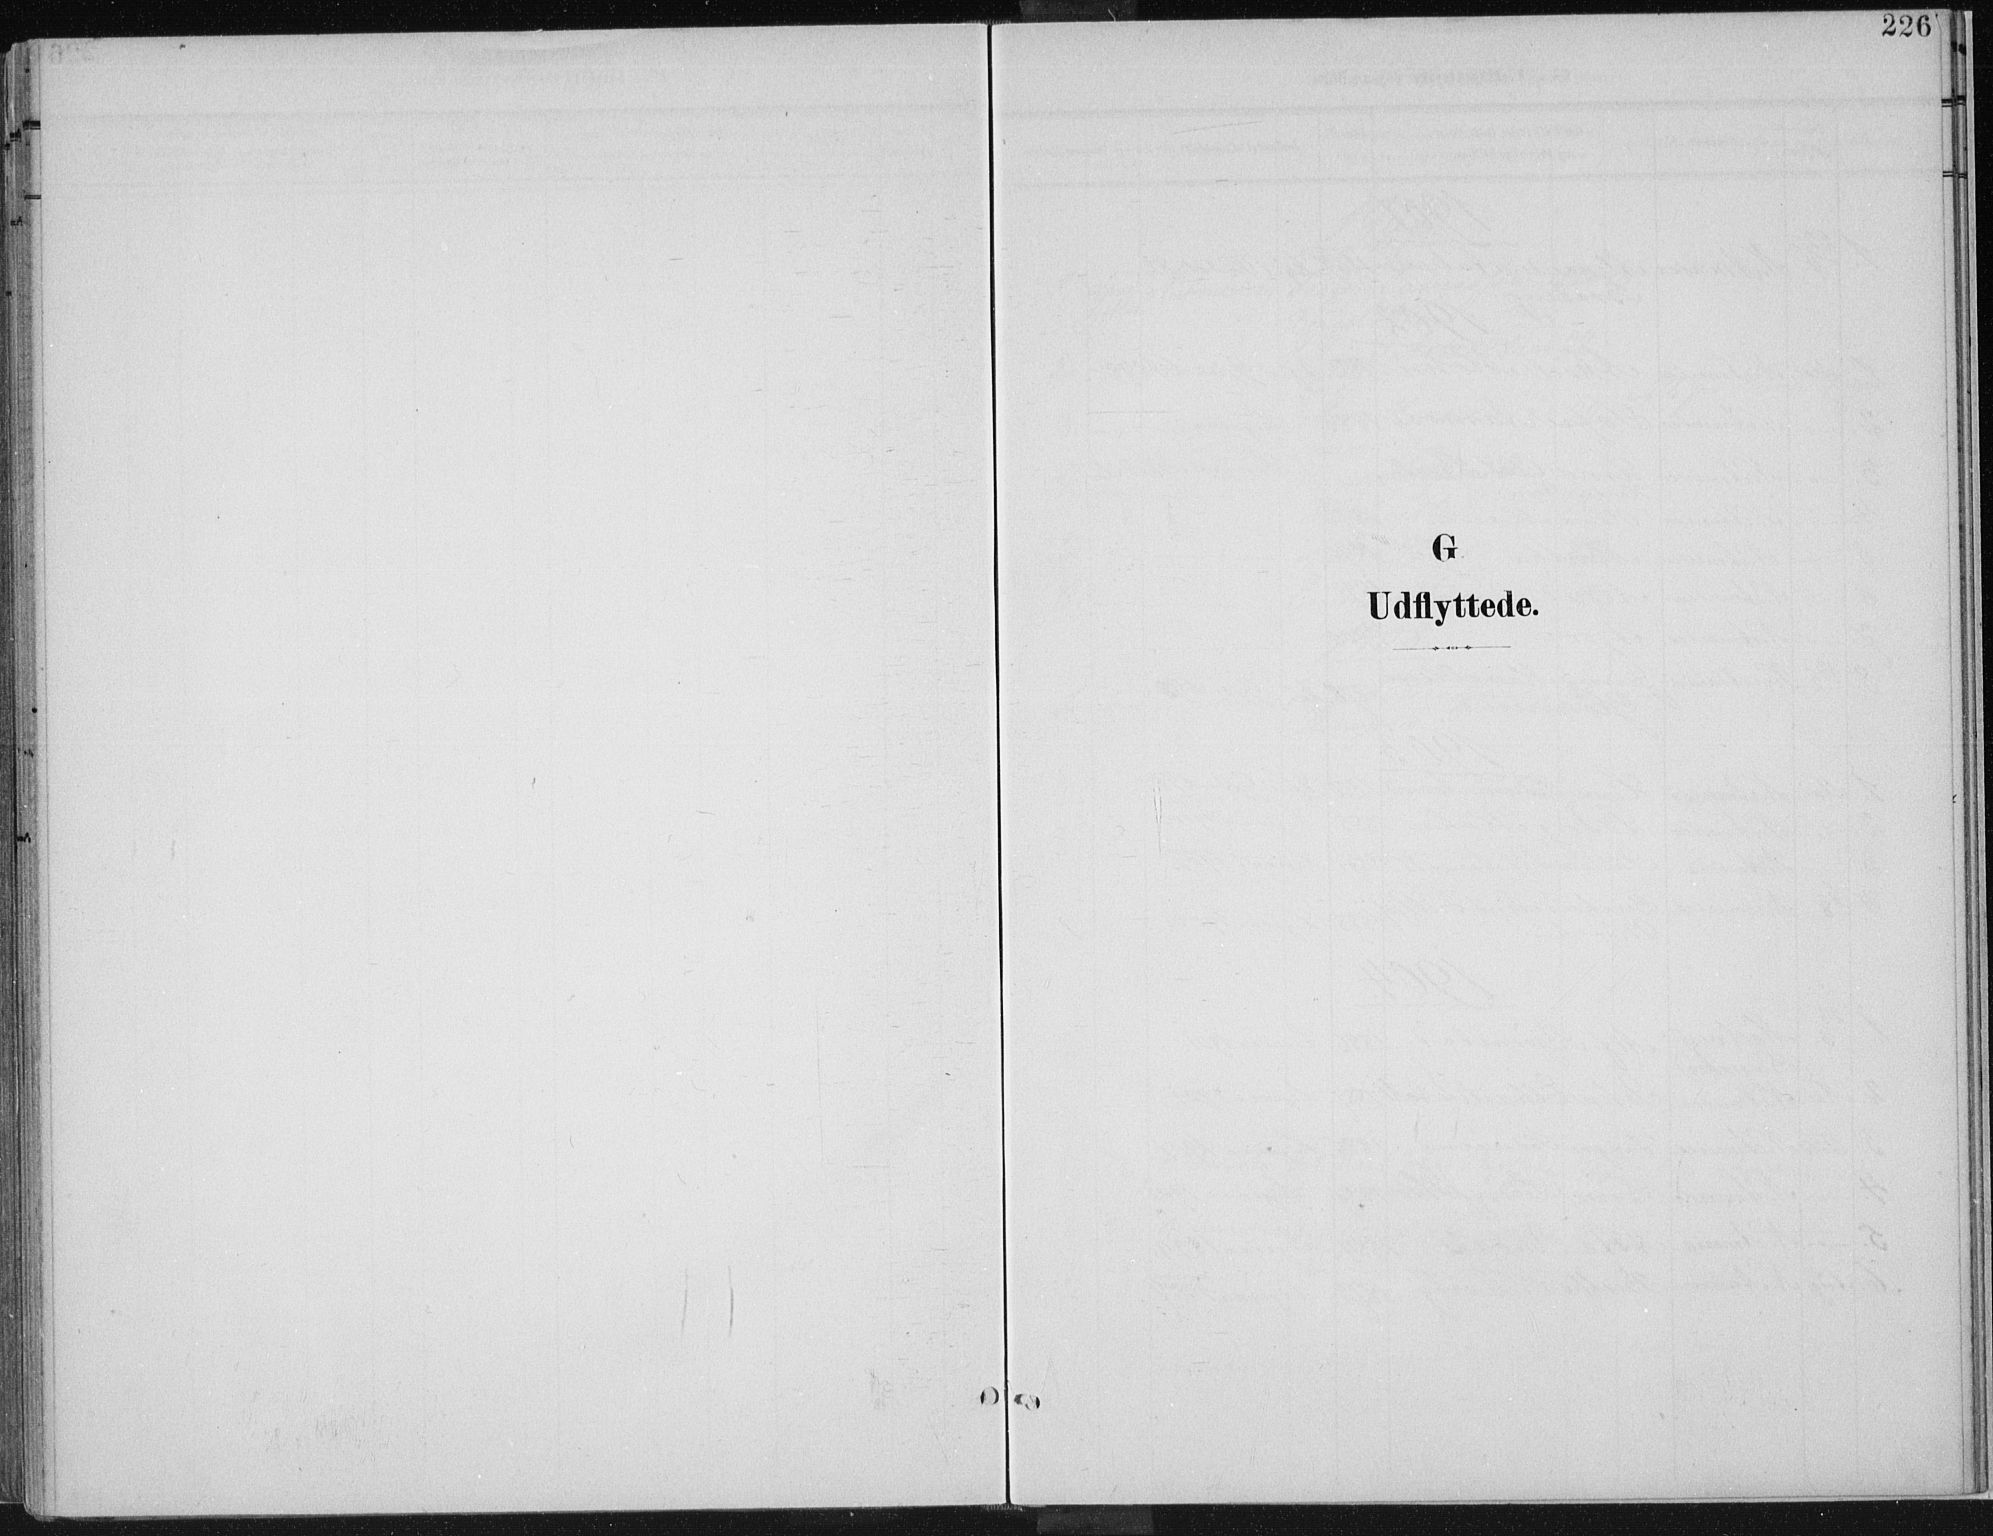 SAH, Vardal prestekontor, H/Ha/Haa/L0013: Ministerialbok nr. 13, 1901-1911, s. 226